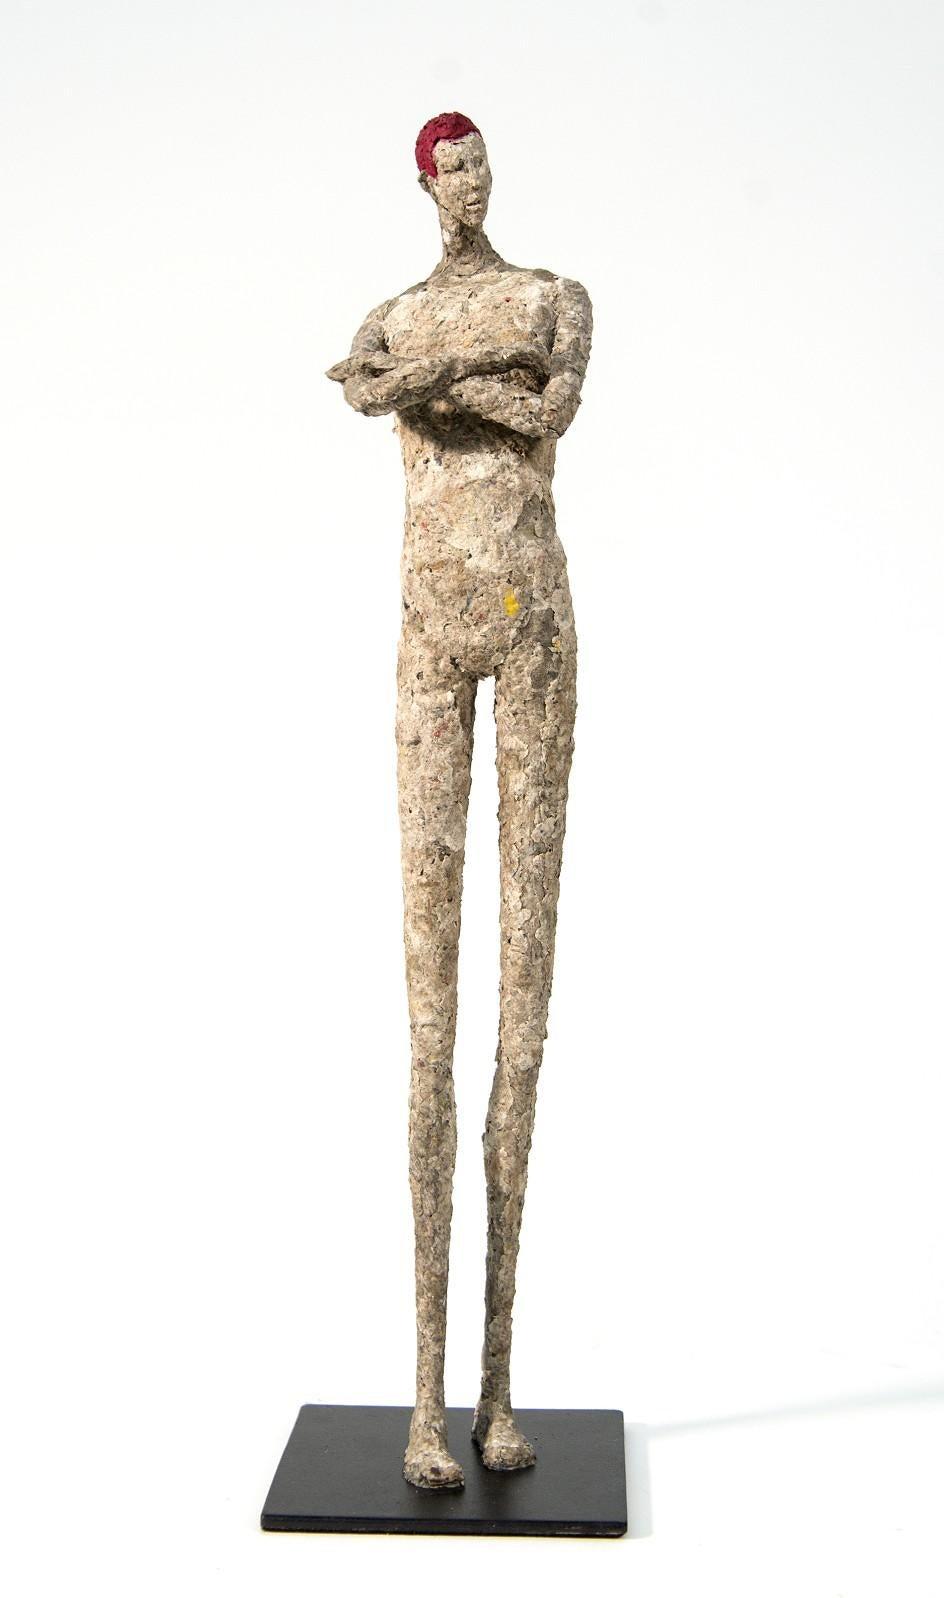 Alexandre the Red - expressive, textured, male, figurative paper mache sculpture